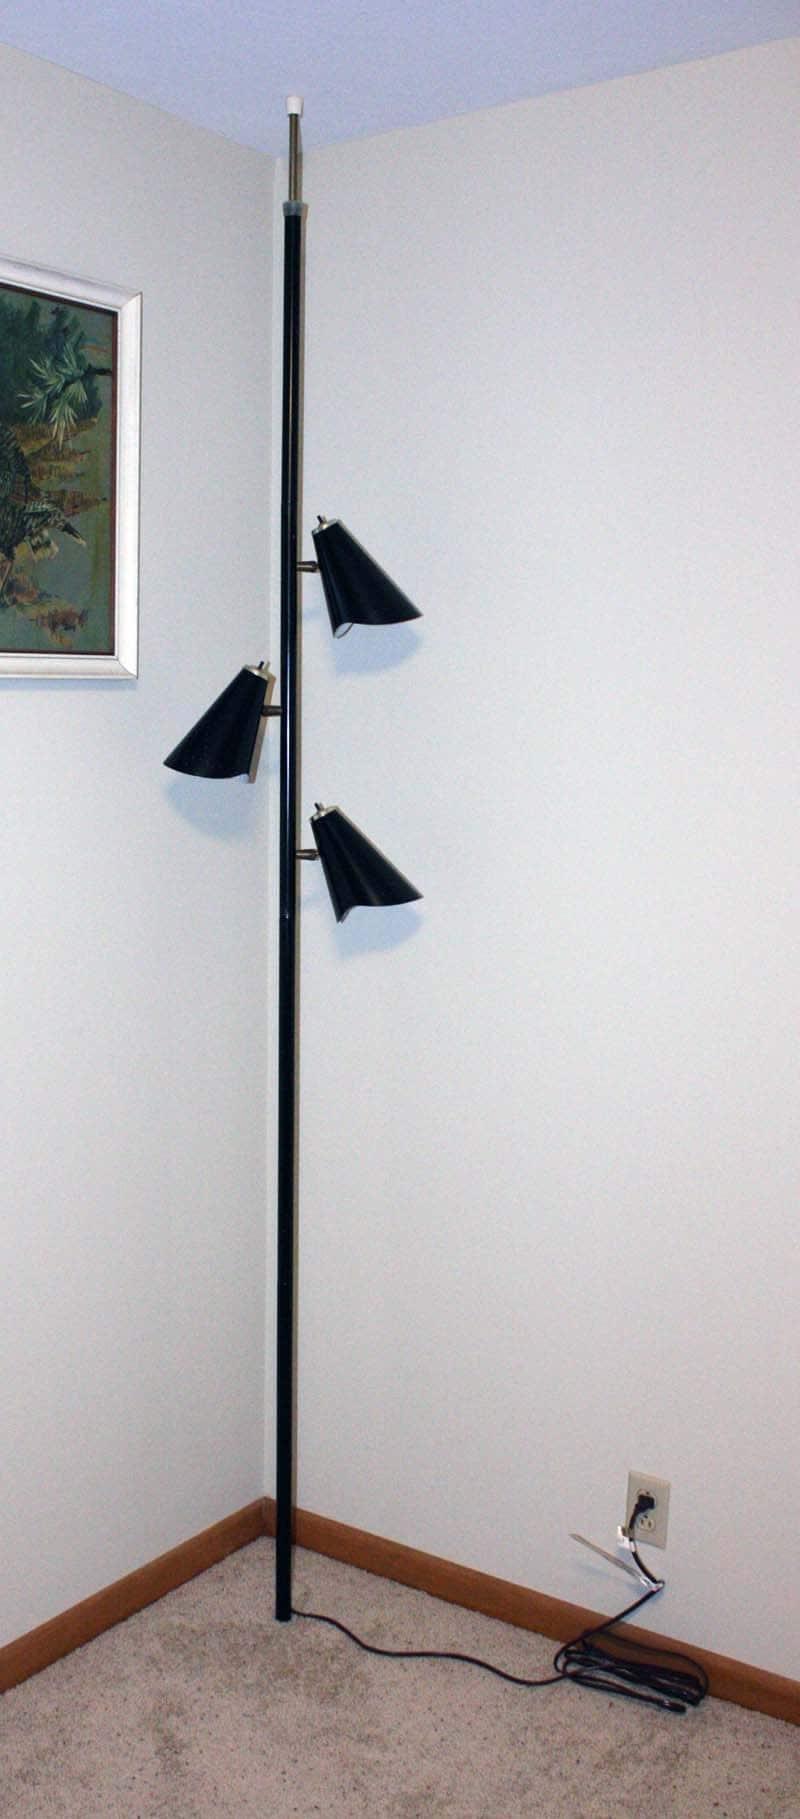 Vintage lamp pole lamp tension pole lamp black by OldCottonwood